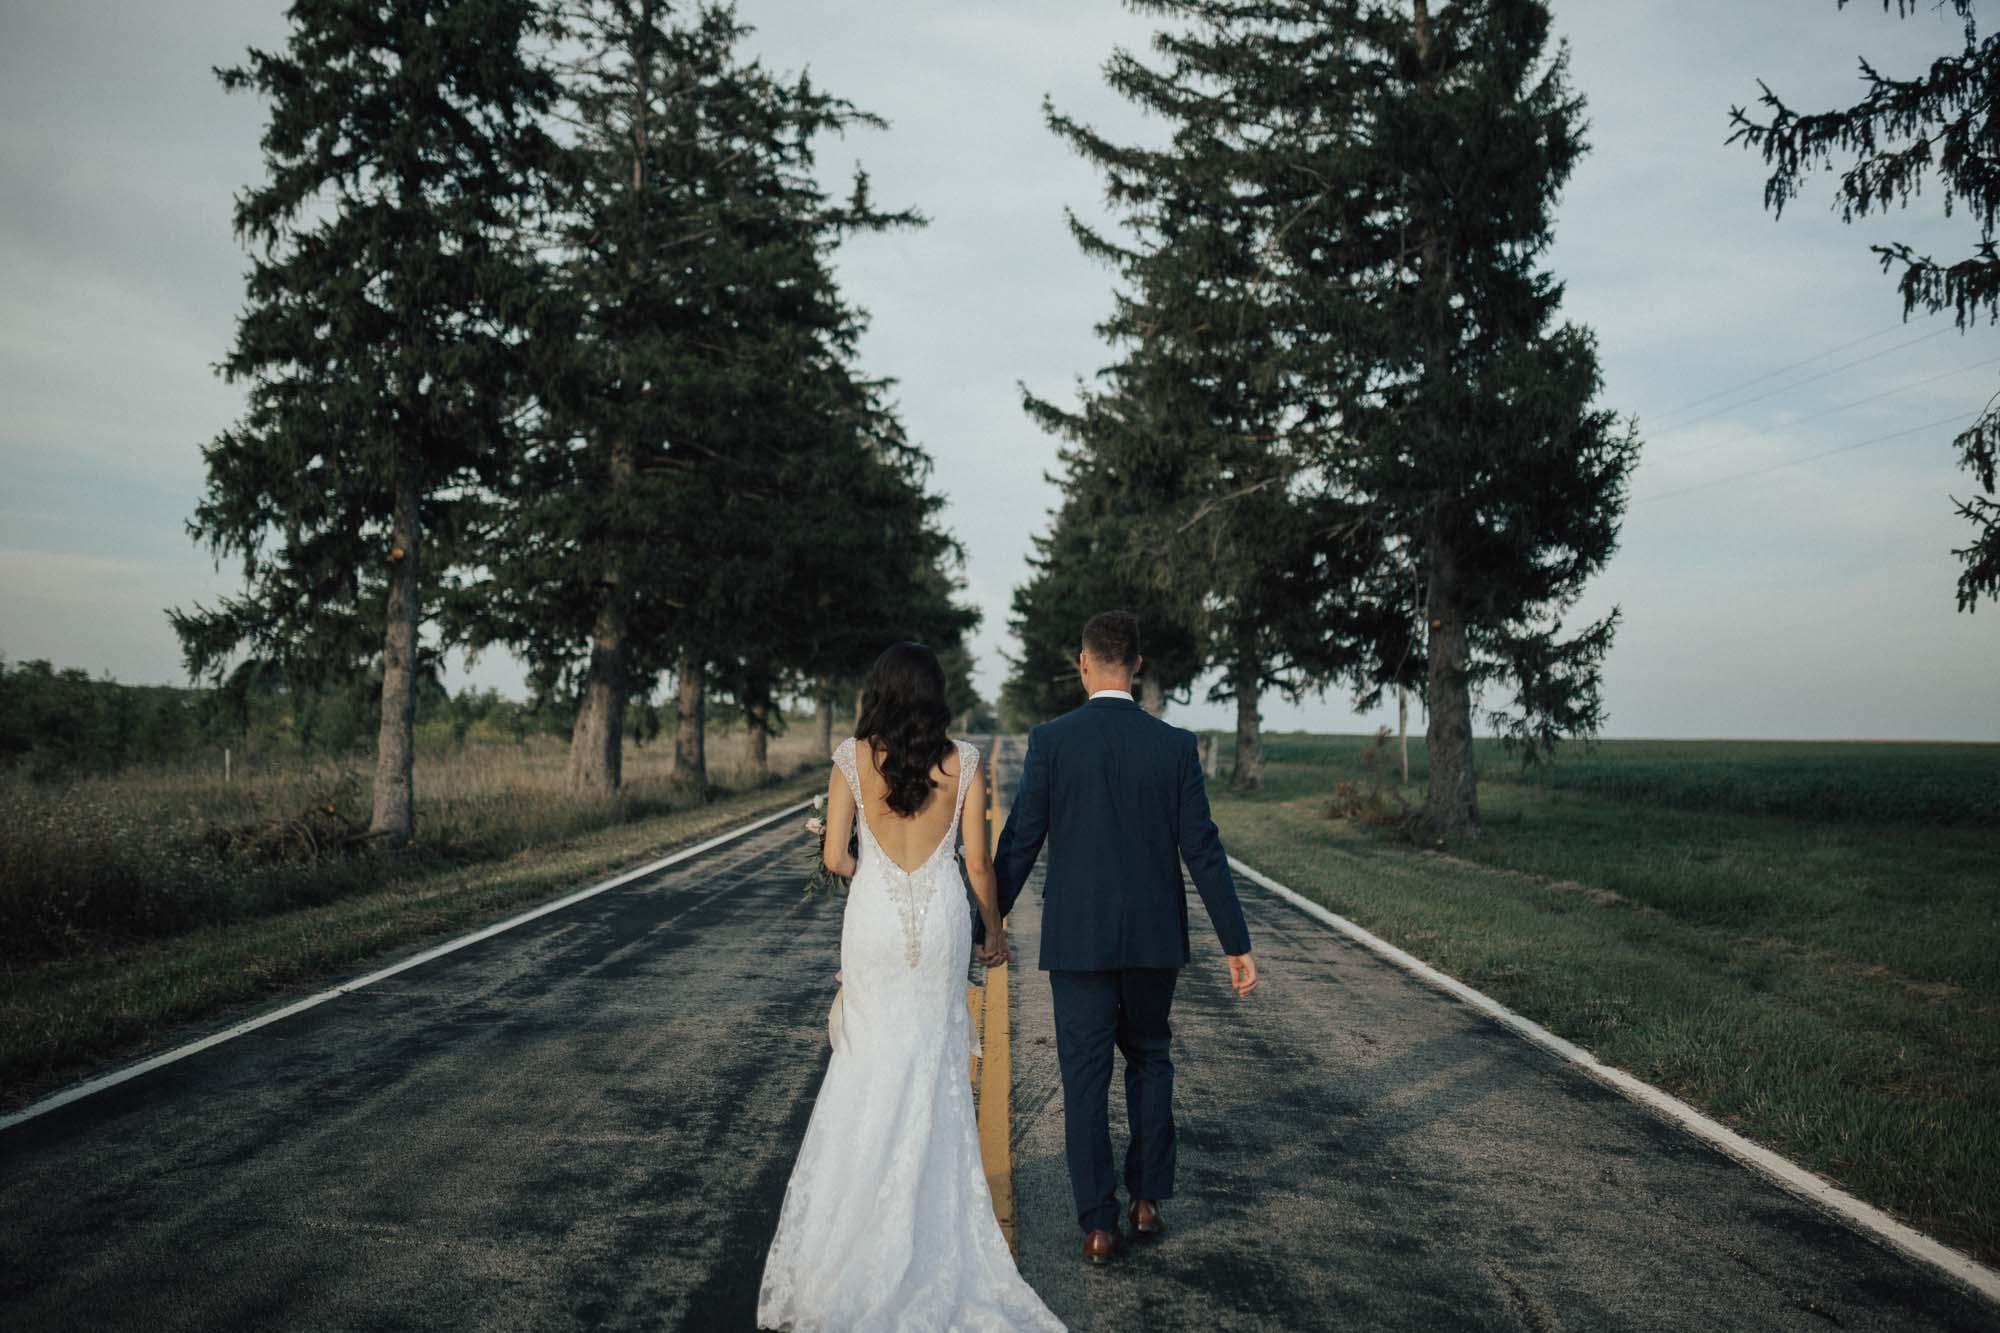 champaign_il_wedding_photography-0759.jpg